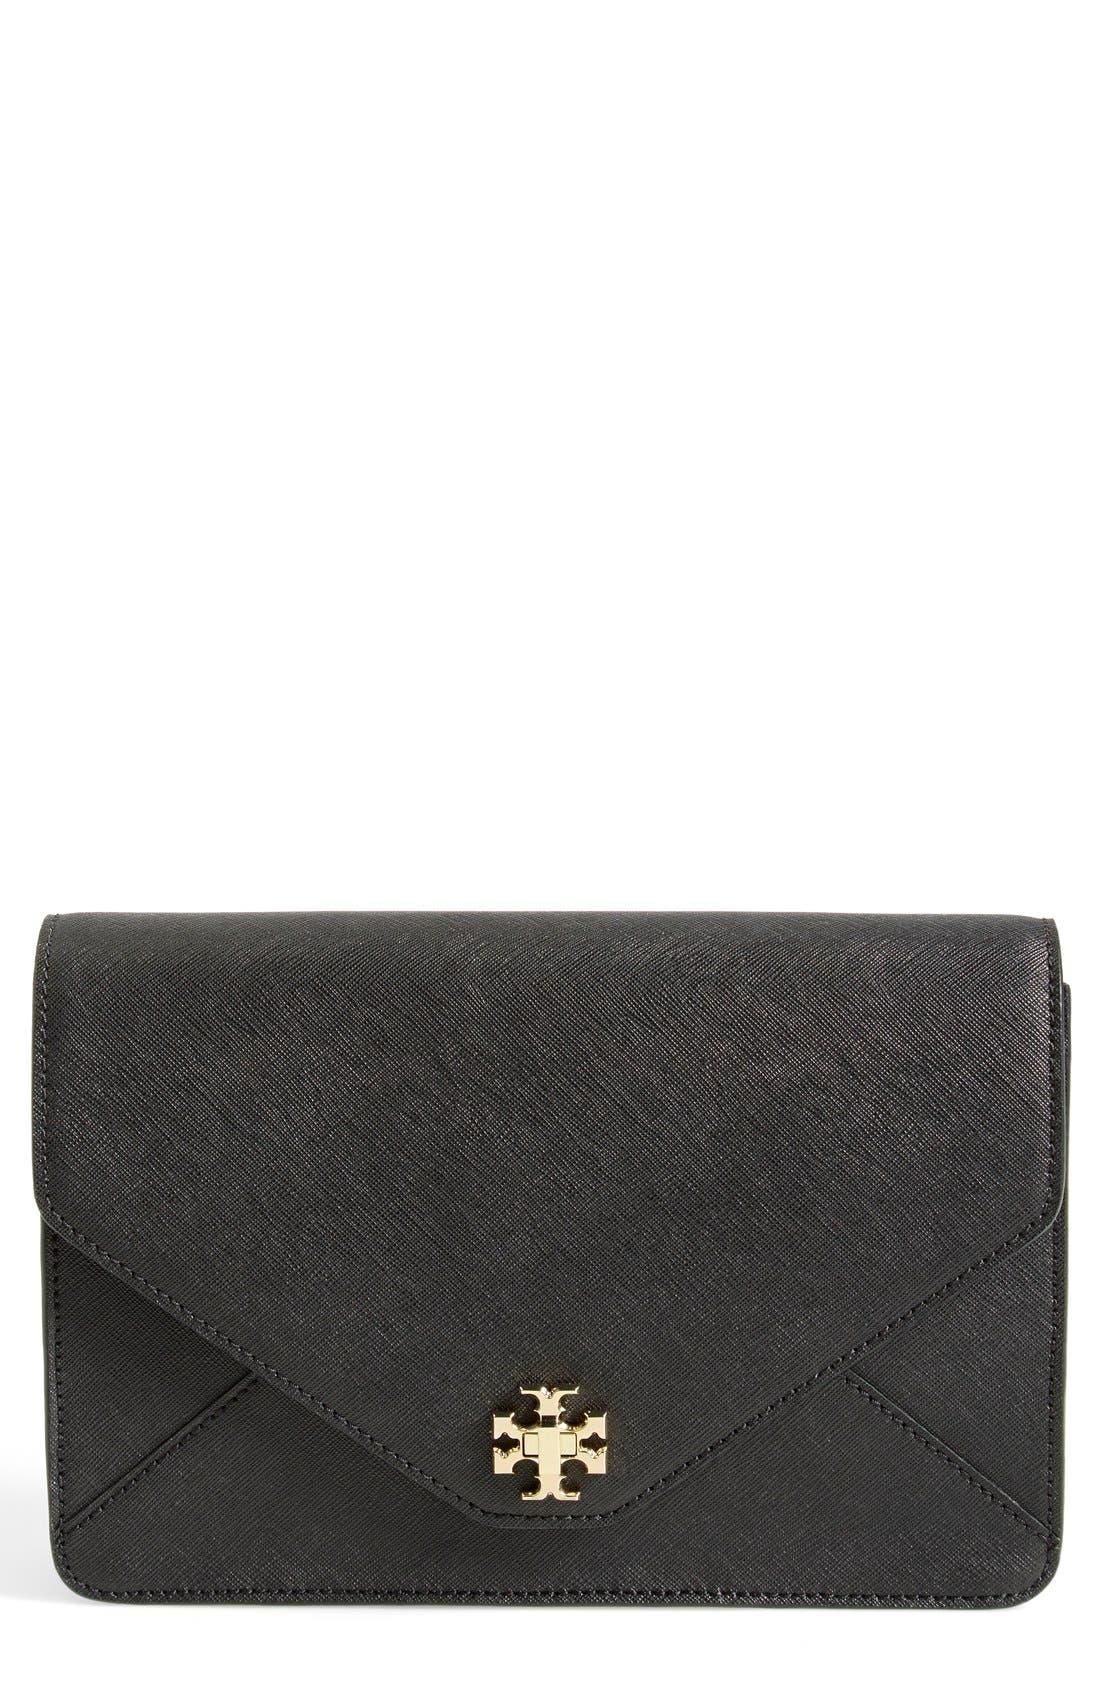 'Kira' Envelope Clutch,                         Main,                         color,